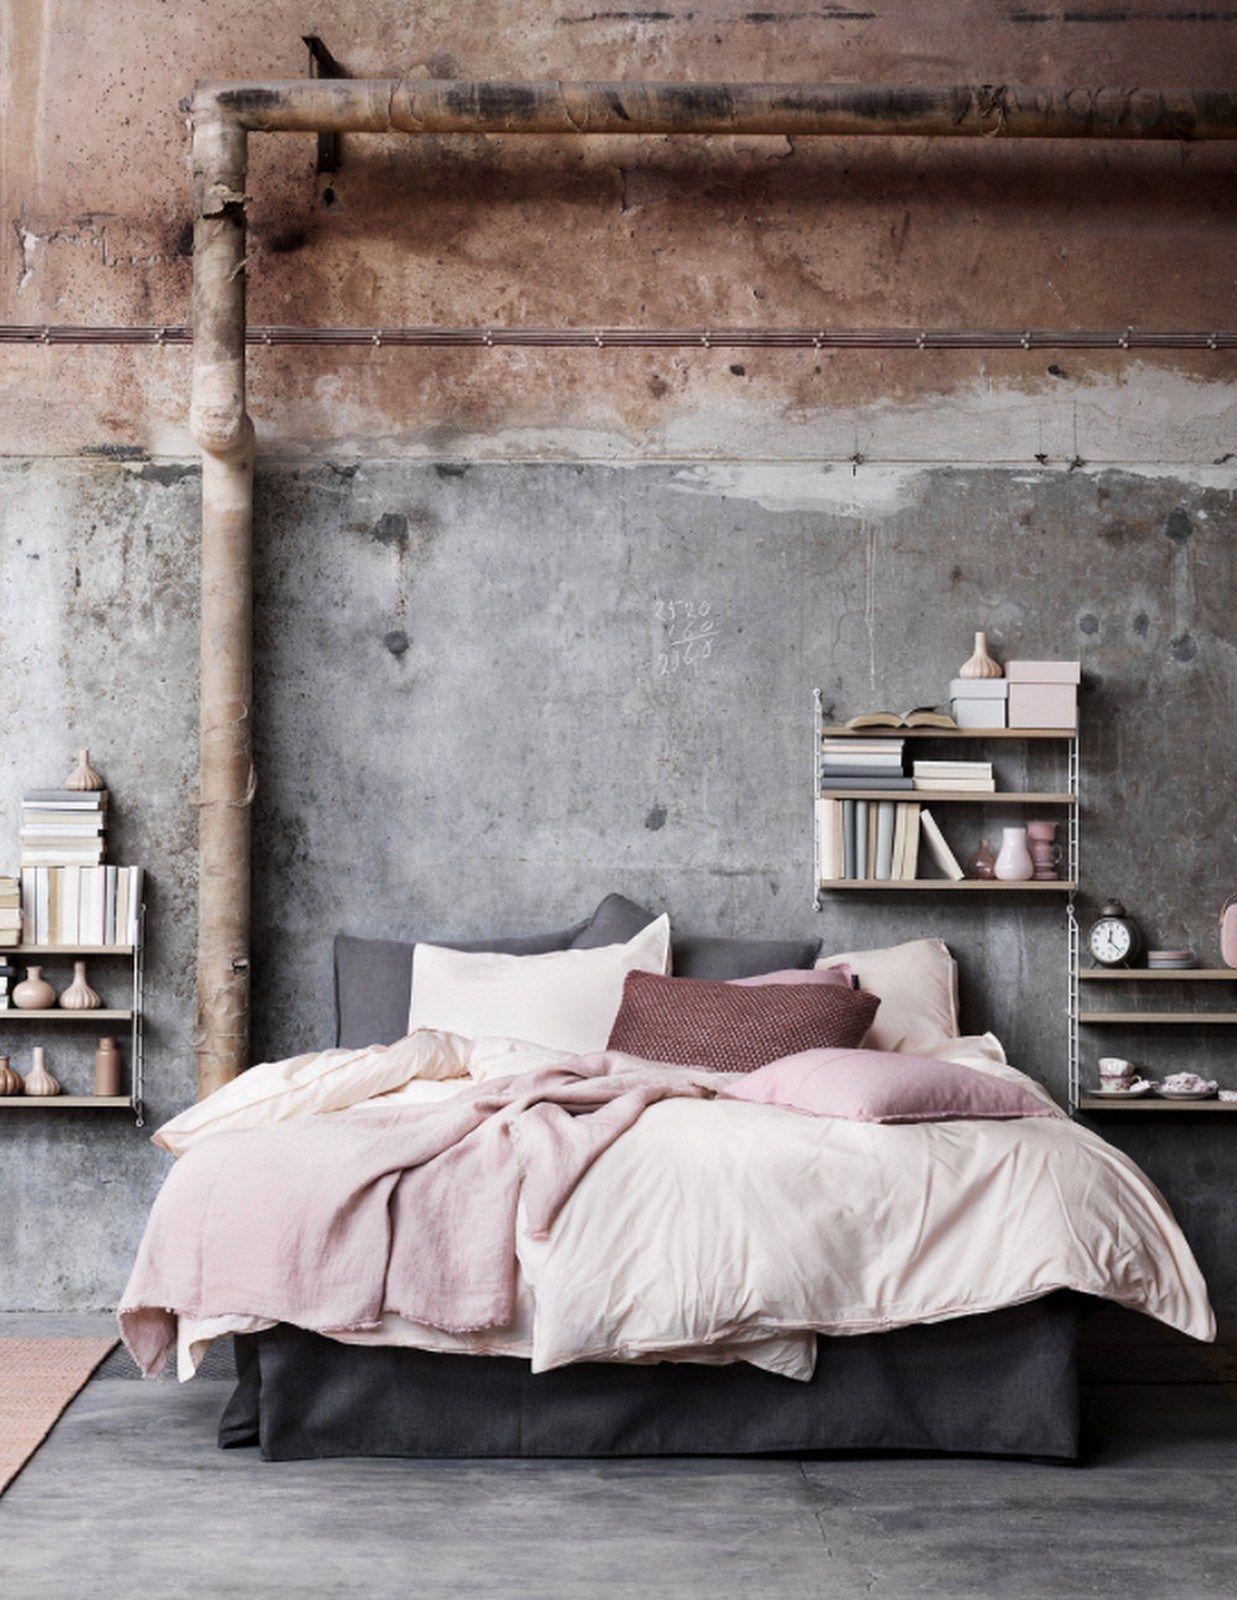 PINK FURNISHINGS www.carmendarwin.com #pink #fuschia #magenta #rooms #design #decor #interiors #furniture #furnishing #interiordesigner #interiorstyling #designschool #designtours carmendarwin